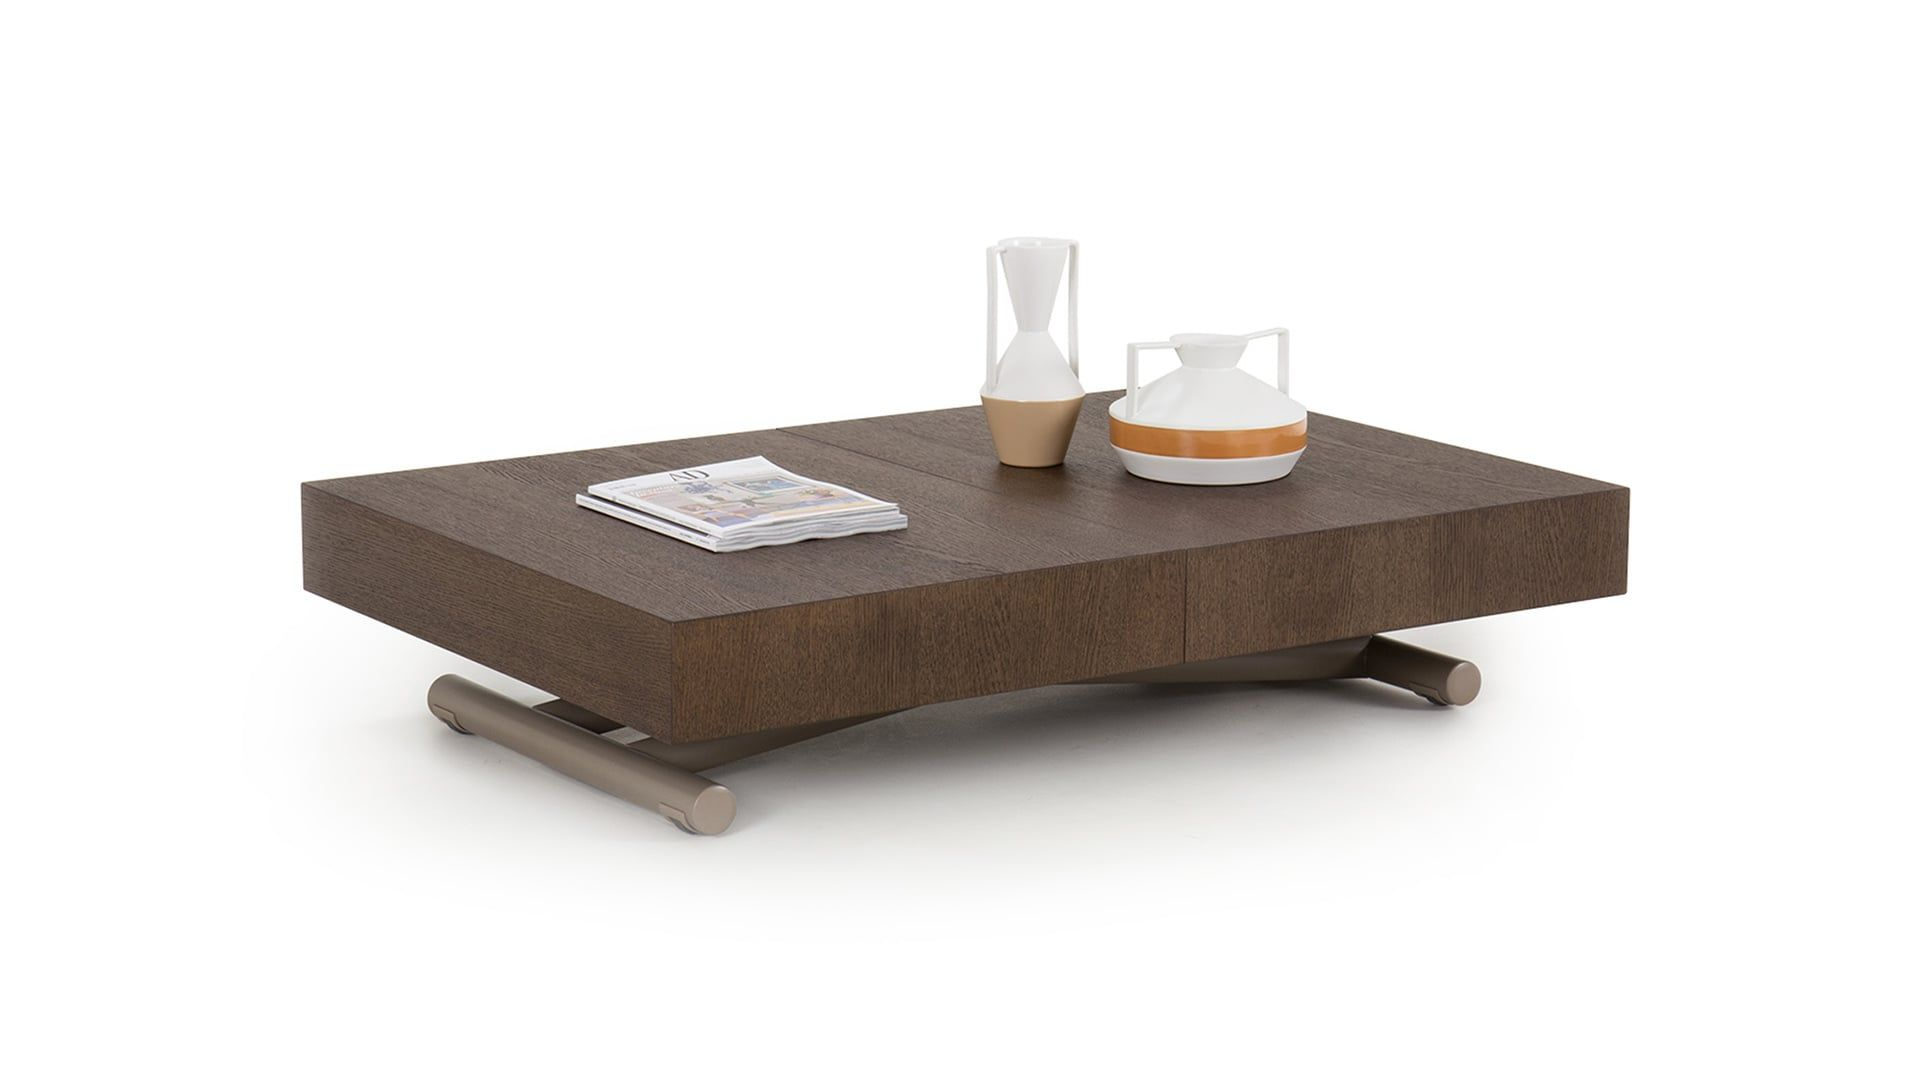 Lucas Bespoke Transforming Coffee Table Coffee Table Big Dining Table 12 Seater Dining Table [ 1080 x 1920 Pixel ]